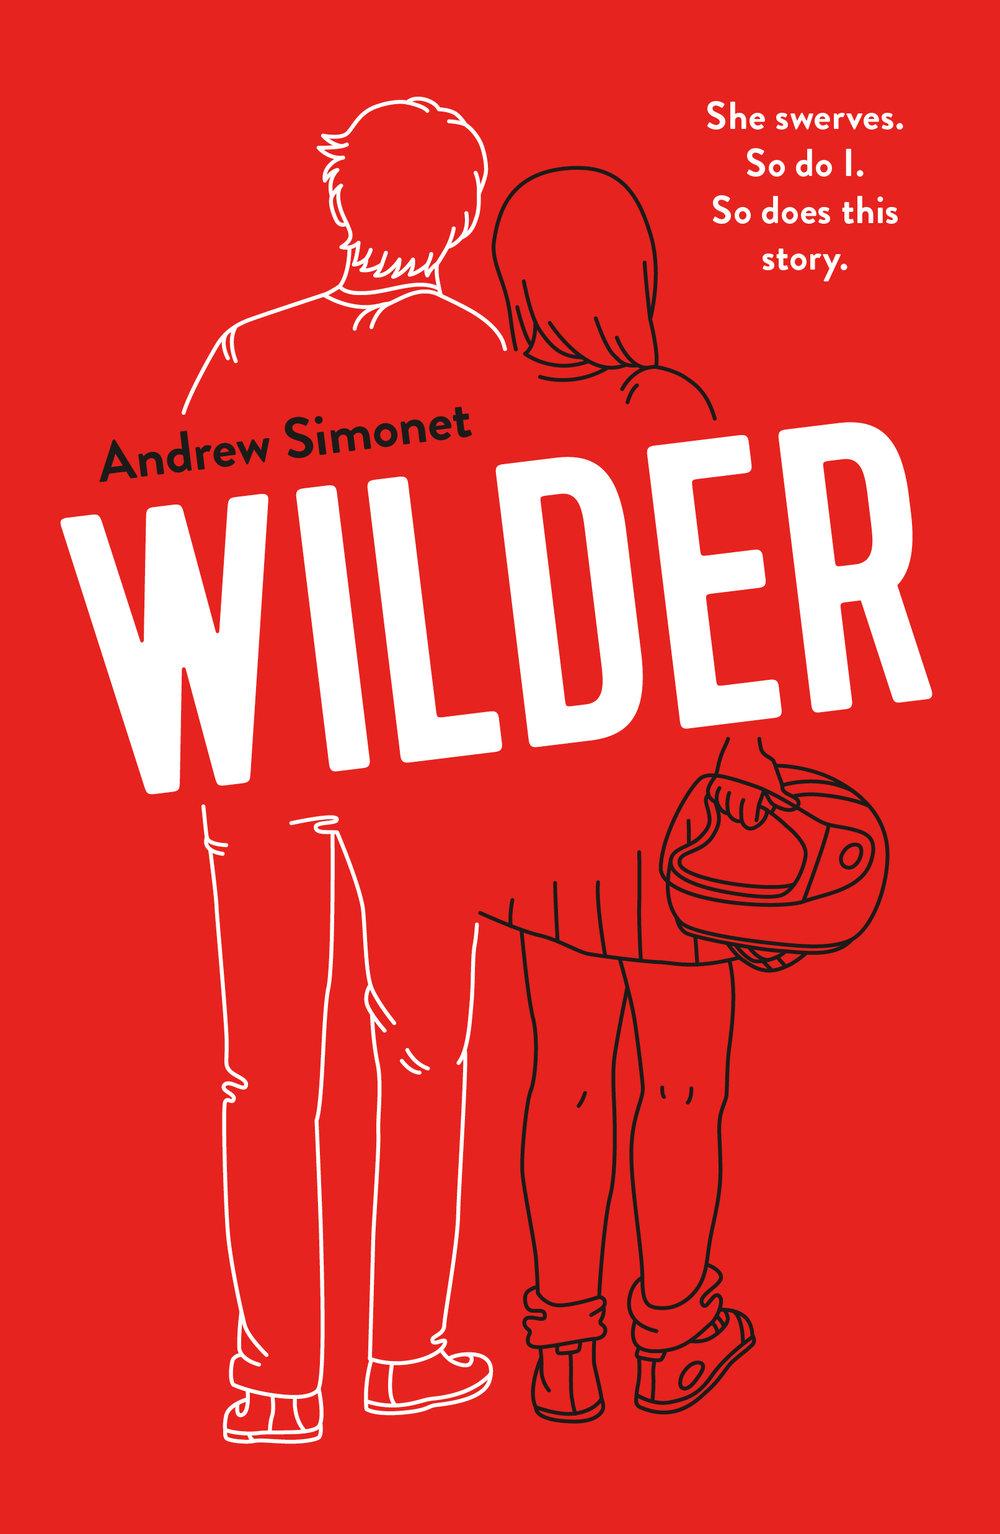 Wilder , Andrew Simonet  For Farrar, Straus and Giroux BYR. Illustration by Aimee Fleck.